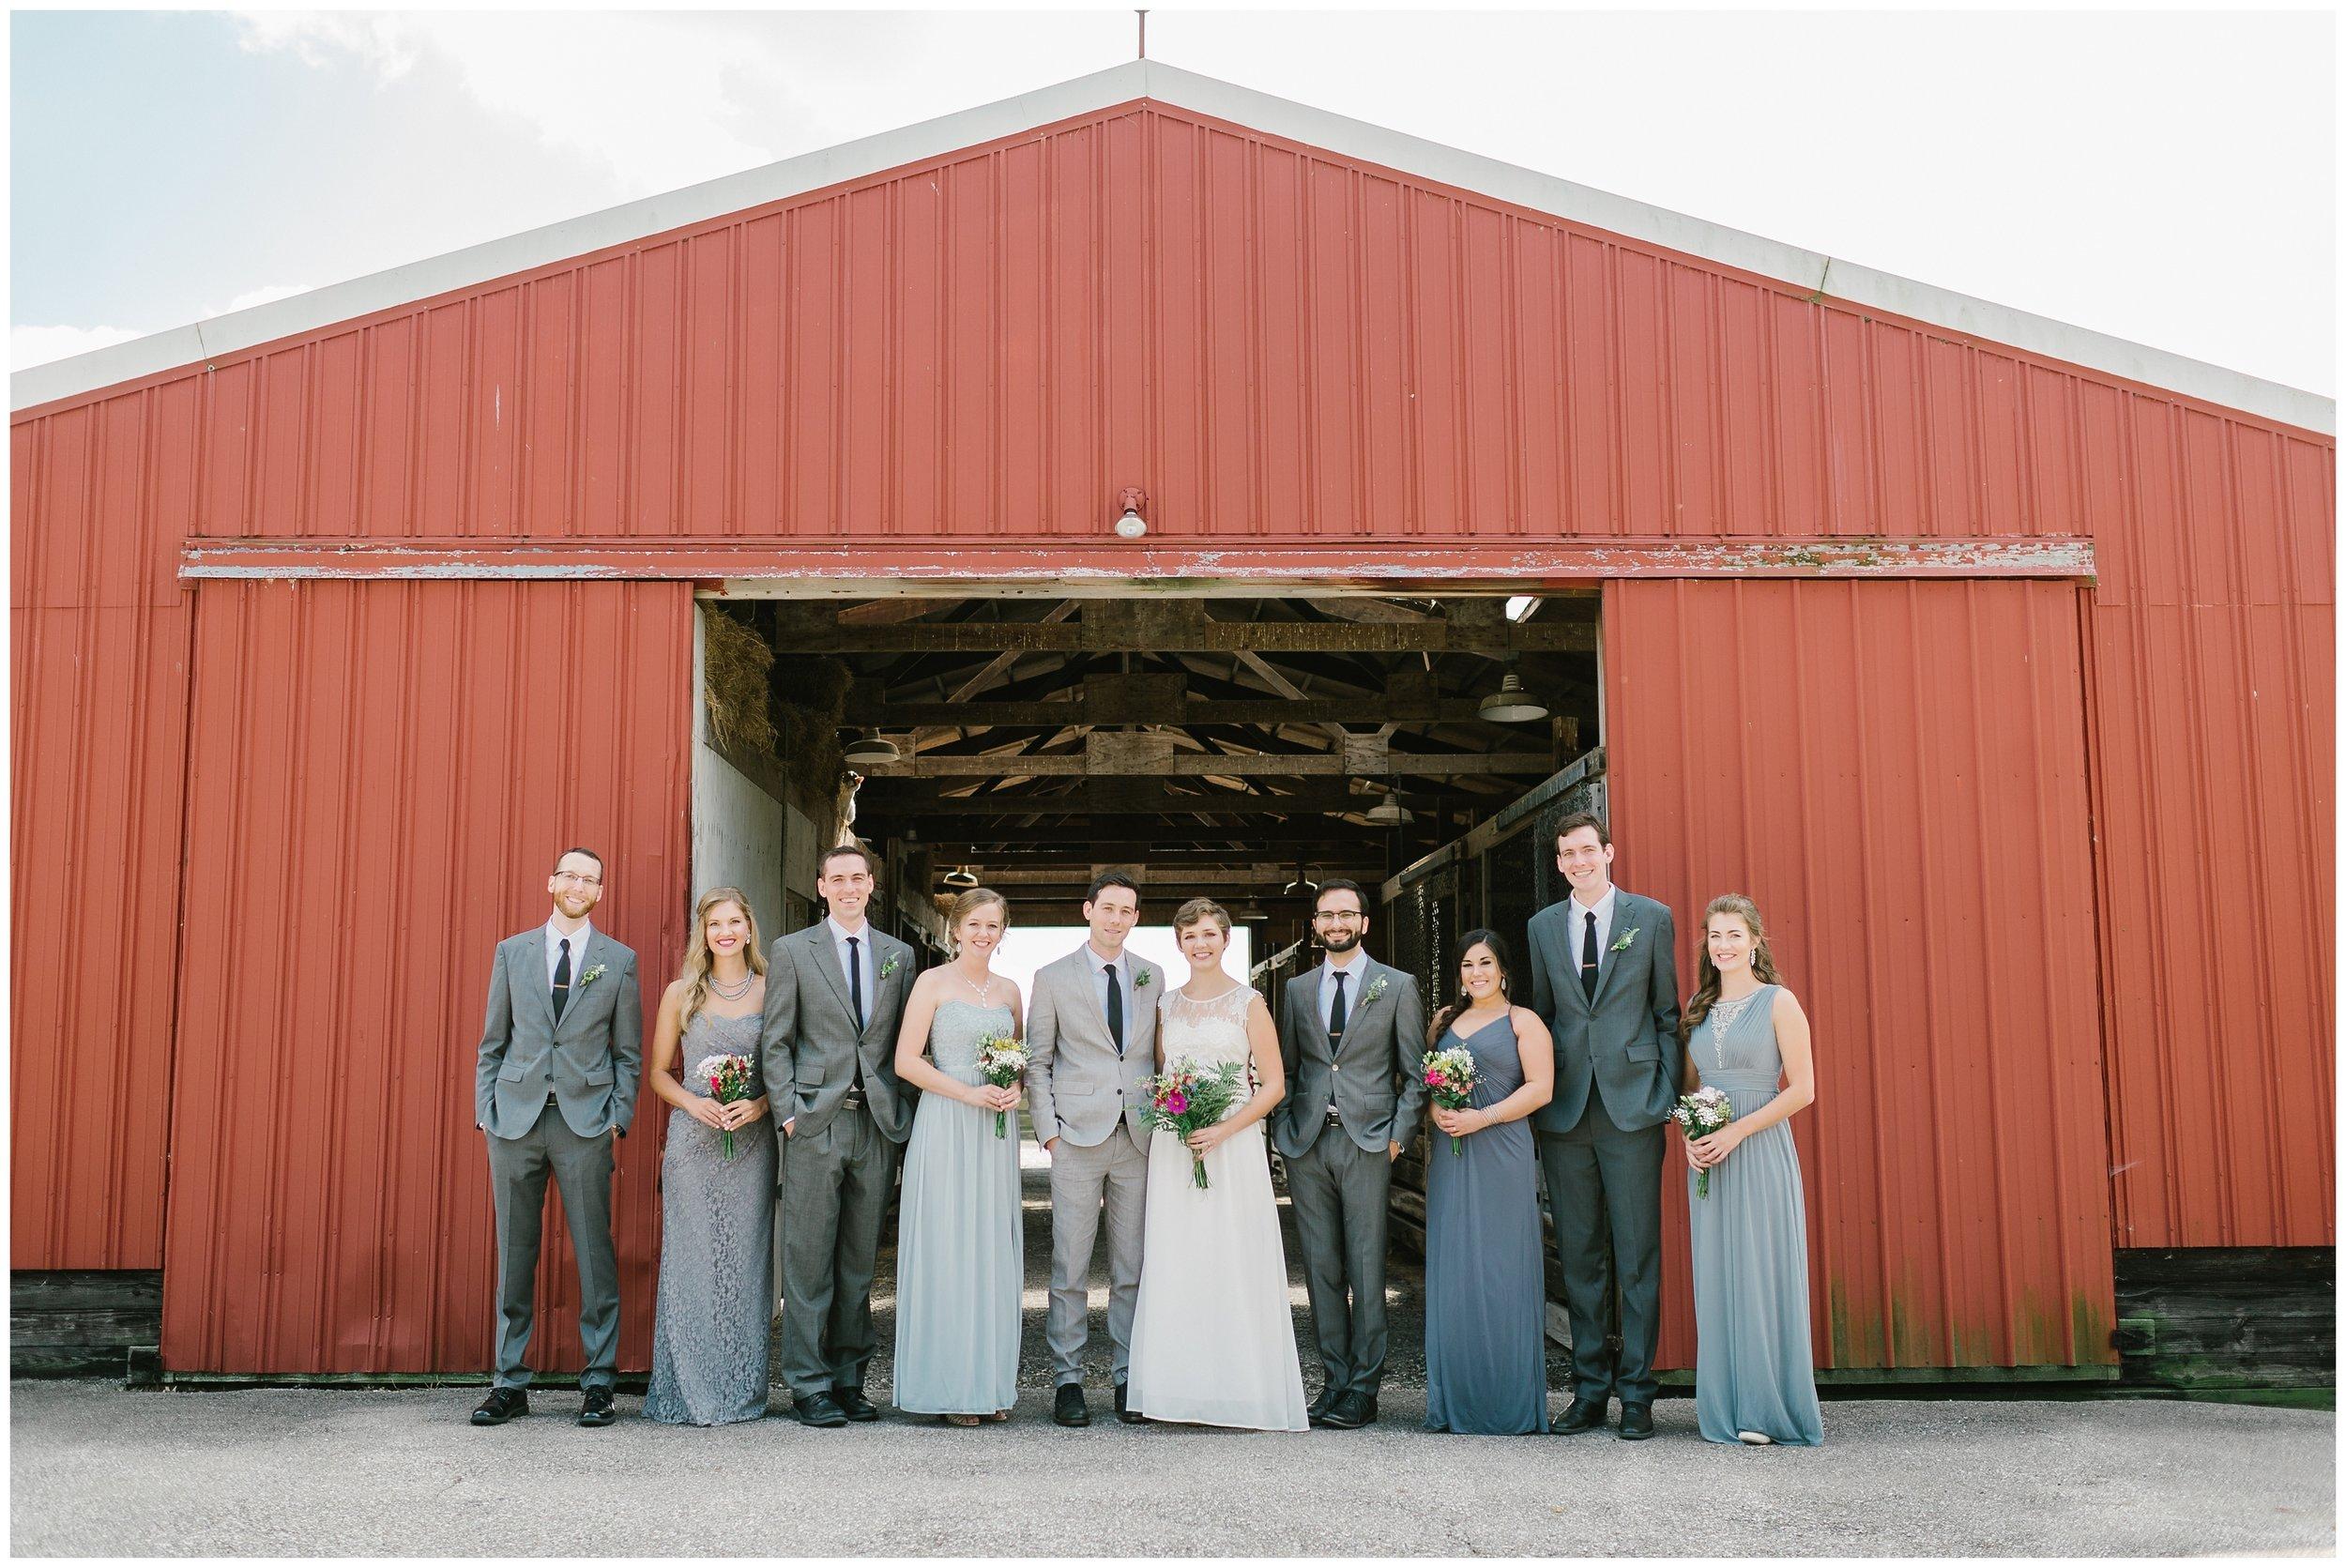 Rebecca_Shehorn_Photography_Indianapolis_Wedding_Photographer_7236.jpg